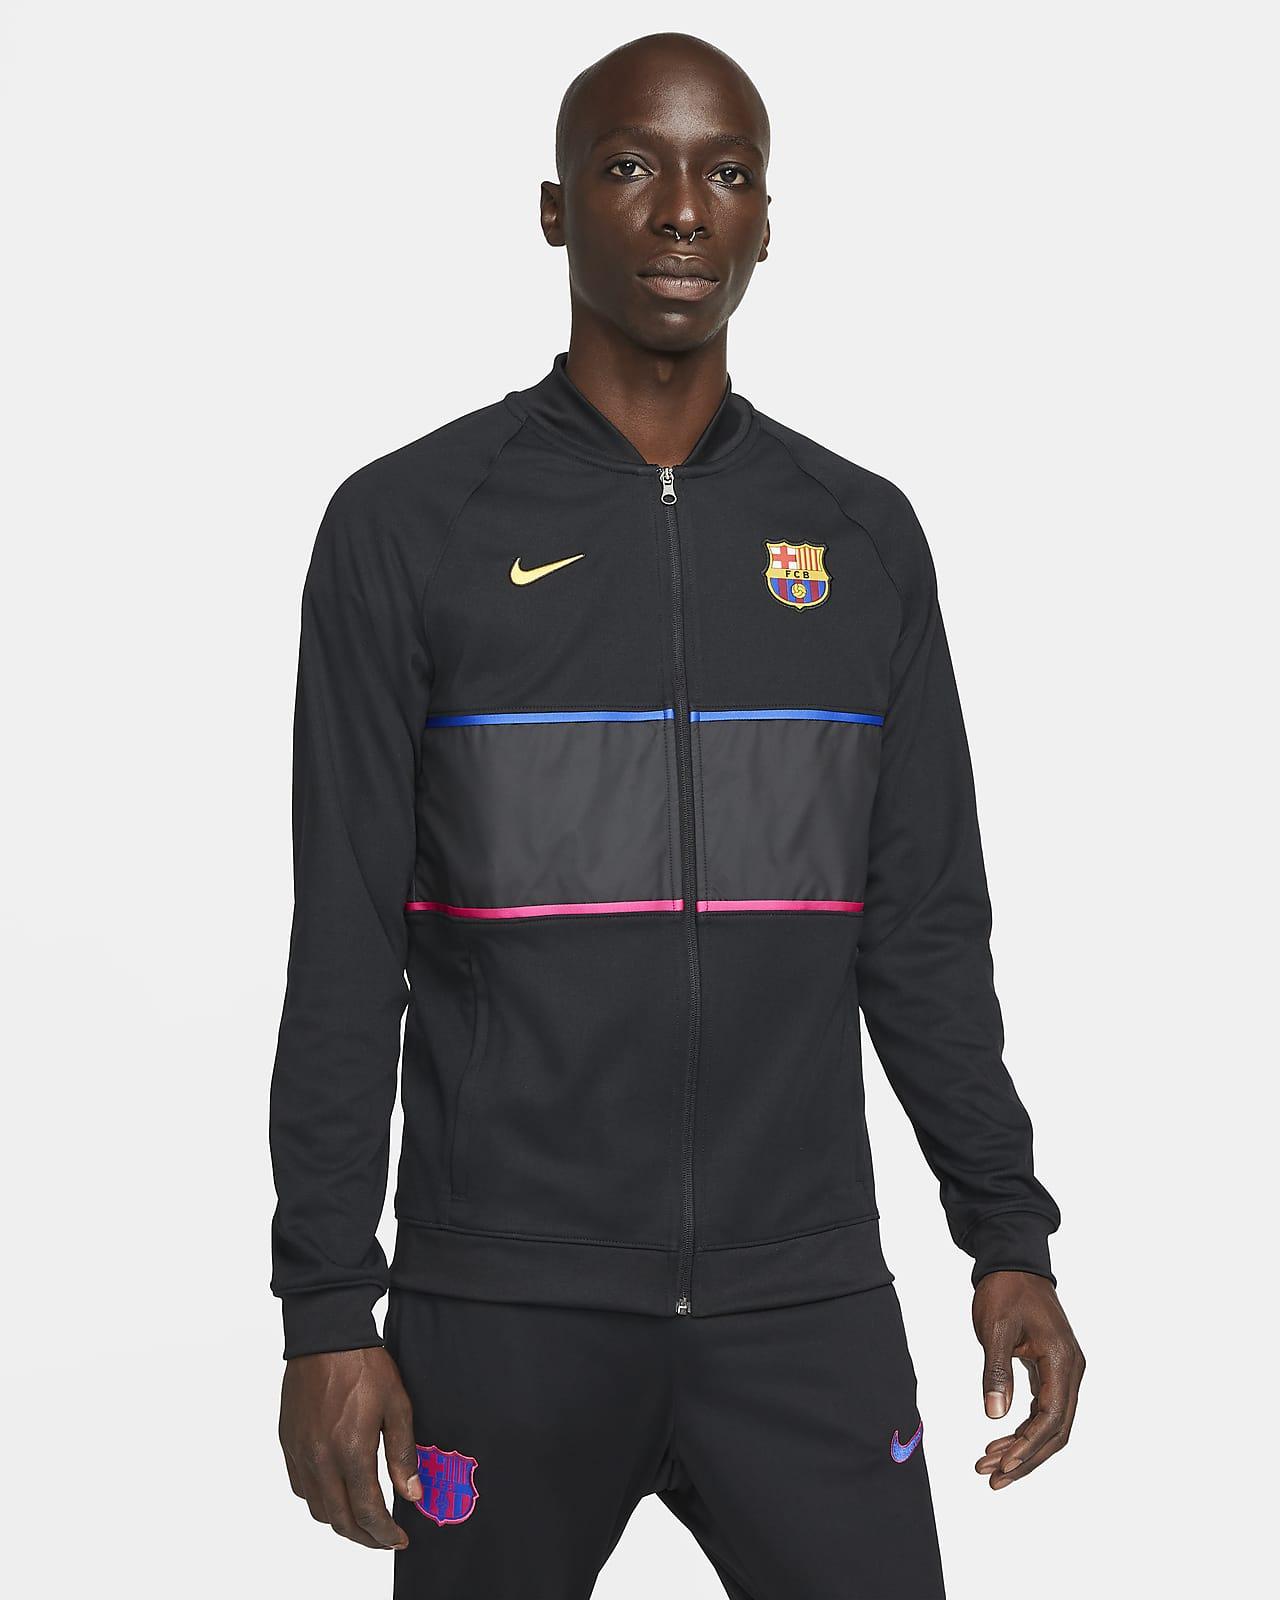 F.C. Barcelona Men's Full-Zip Football Jacket